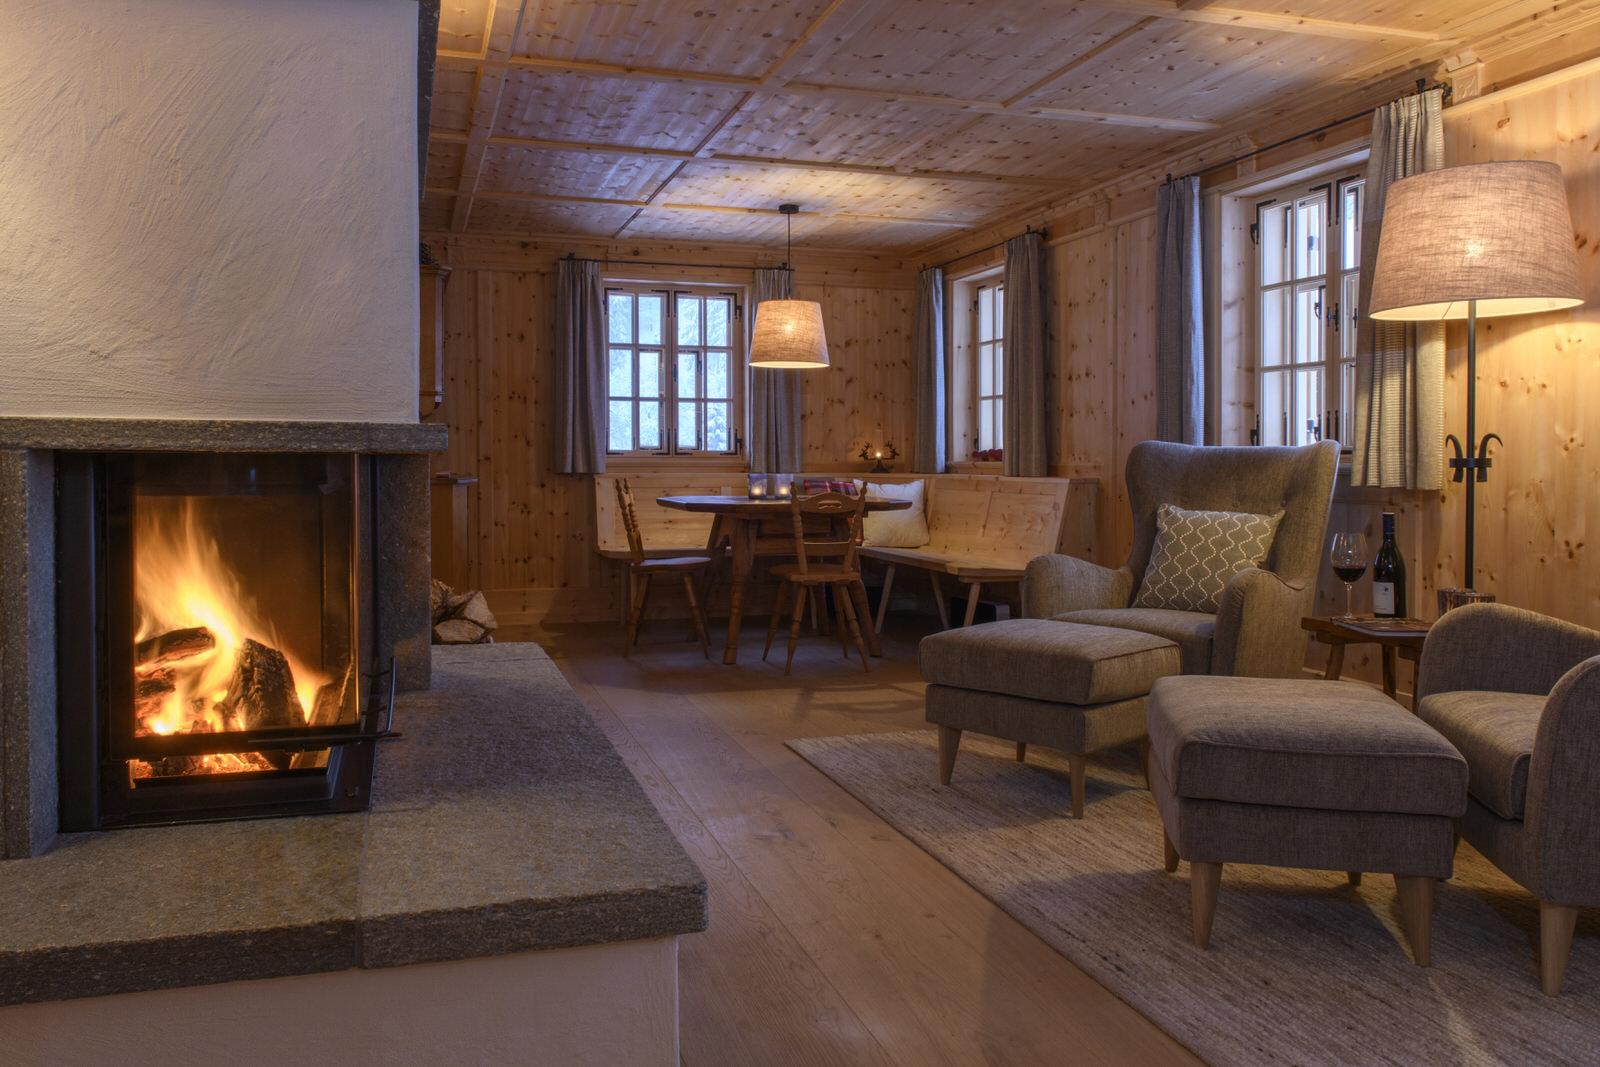 Mountain lodge Gauertal in the Montafon - living